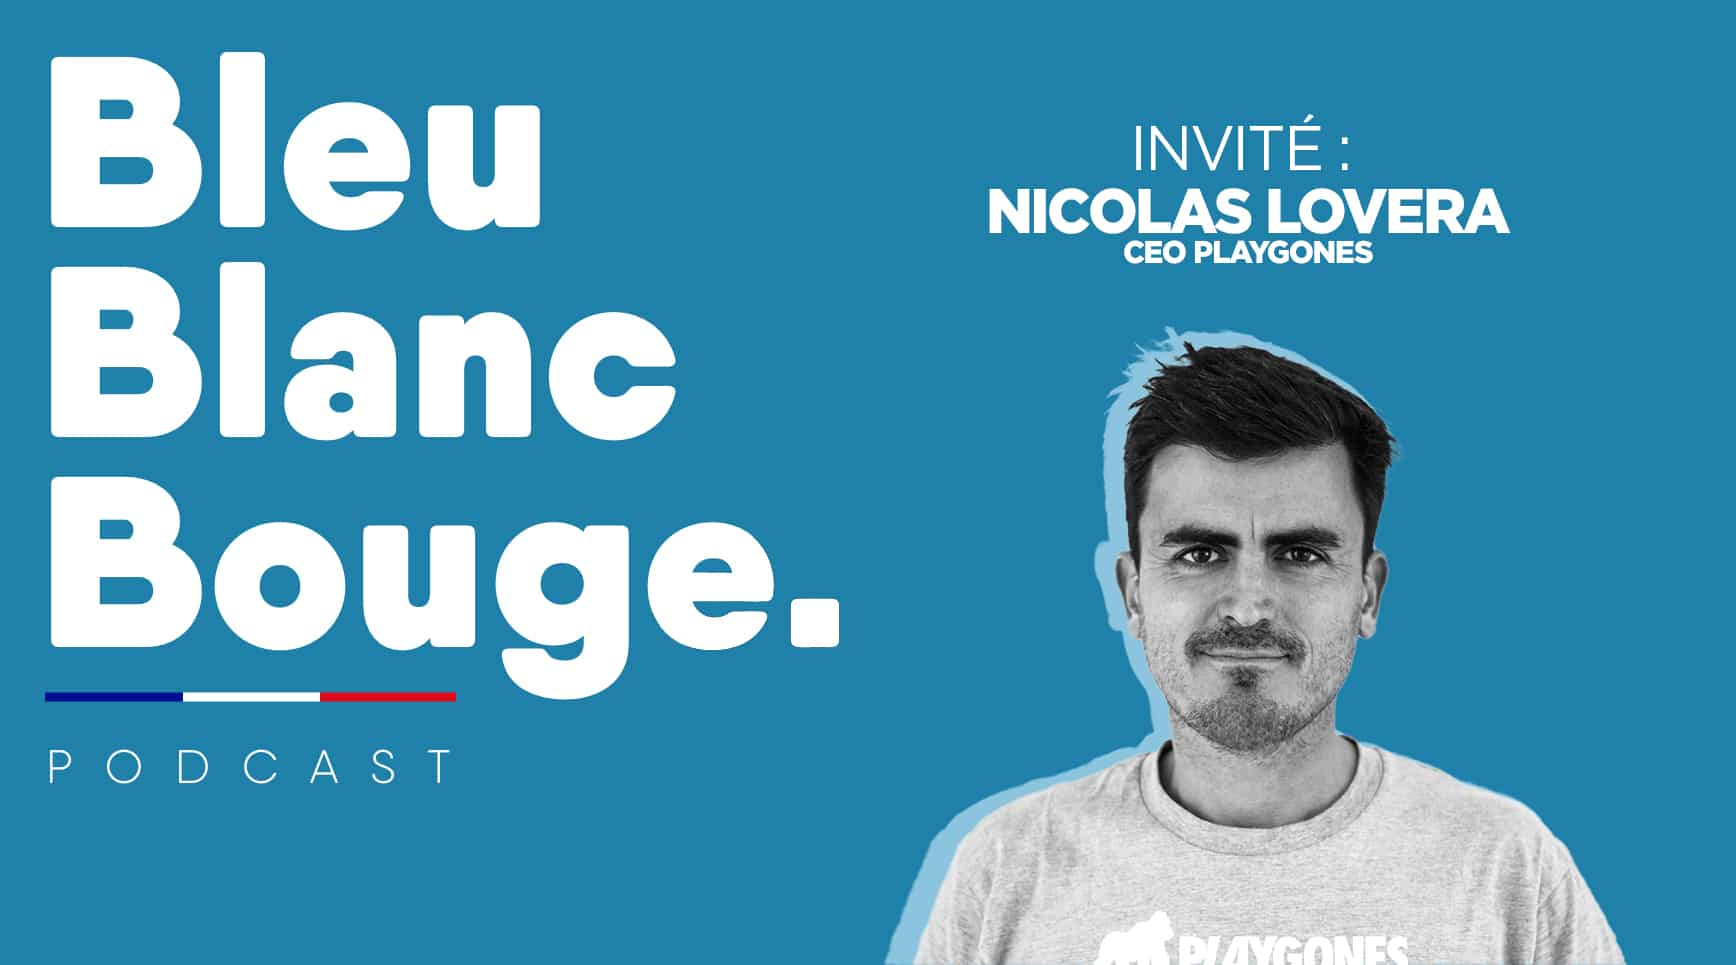 Podcast-NICOLAS-LOVERA-PLAYGONES